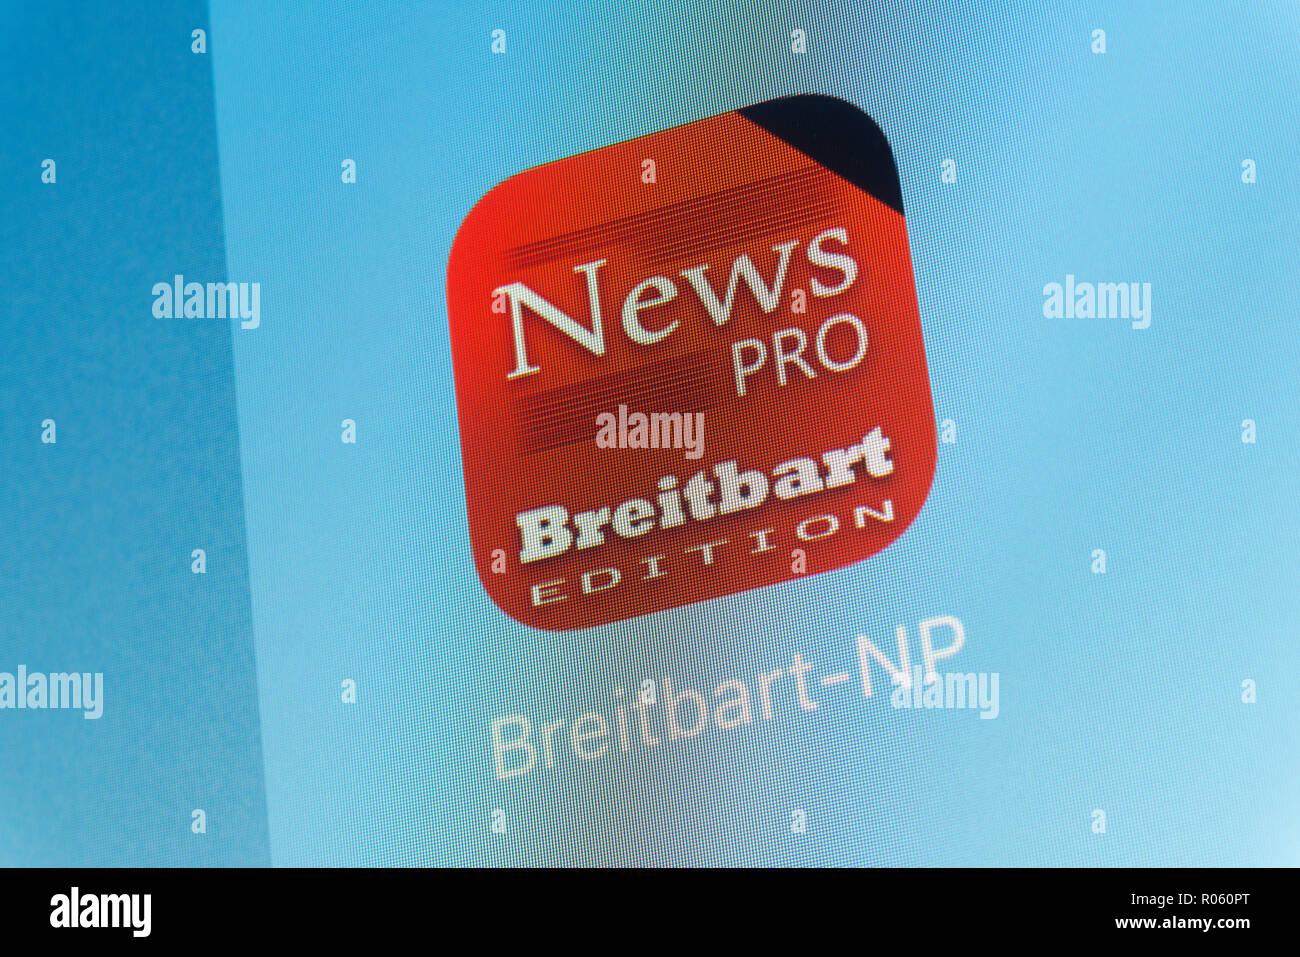 Breitbart App on cellphone screen Stock Photo: 223867136 - Alamy